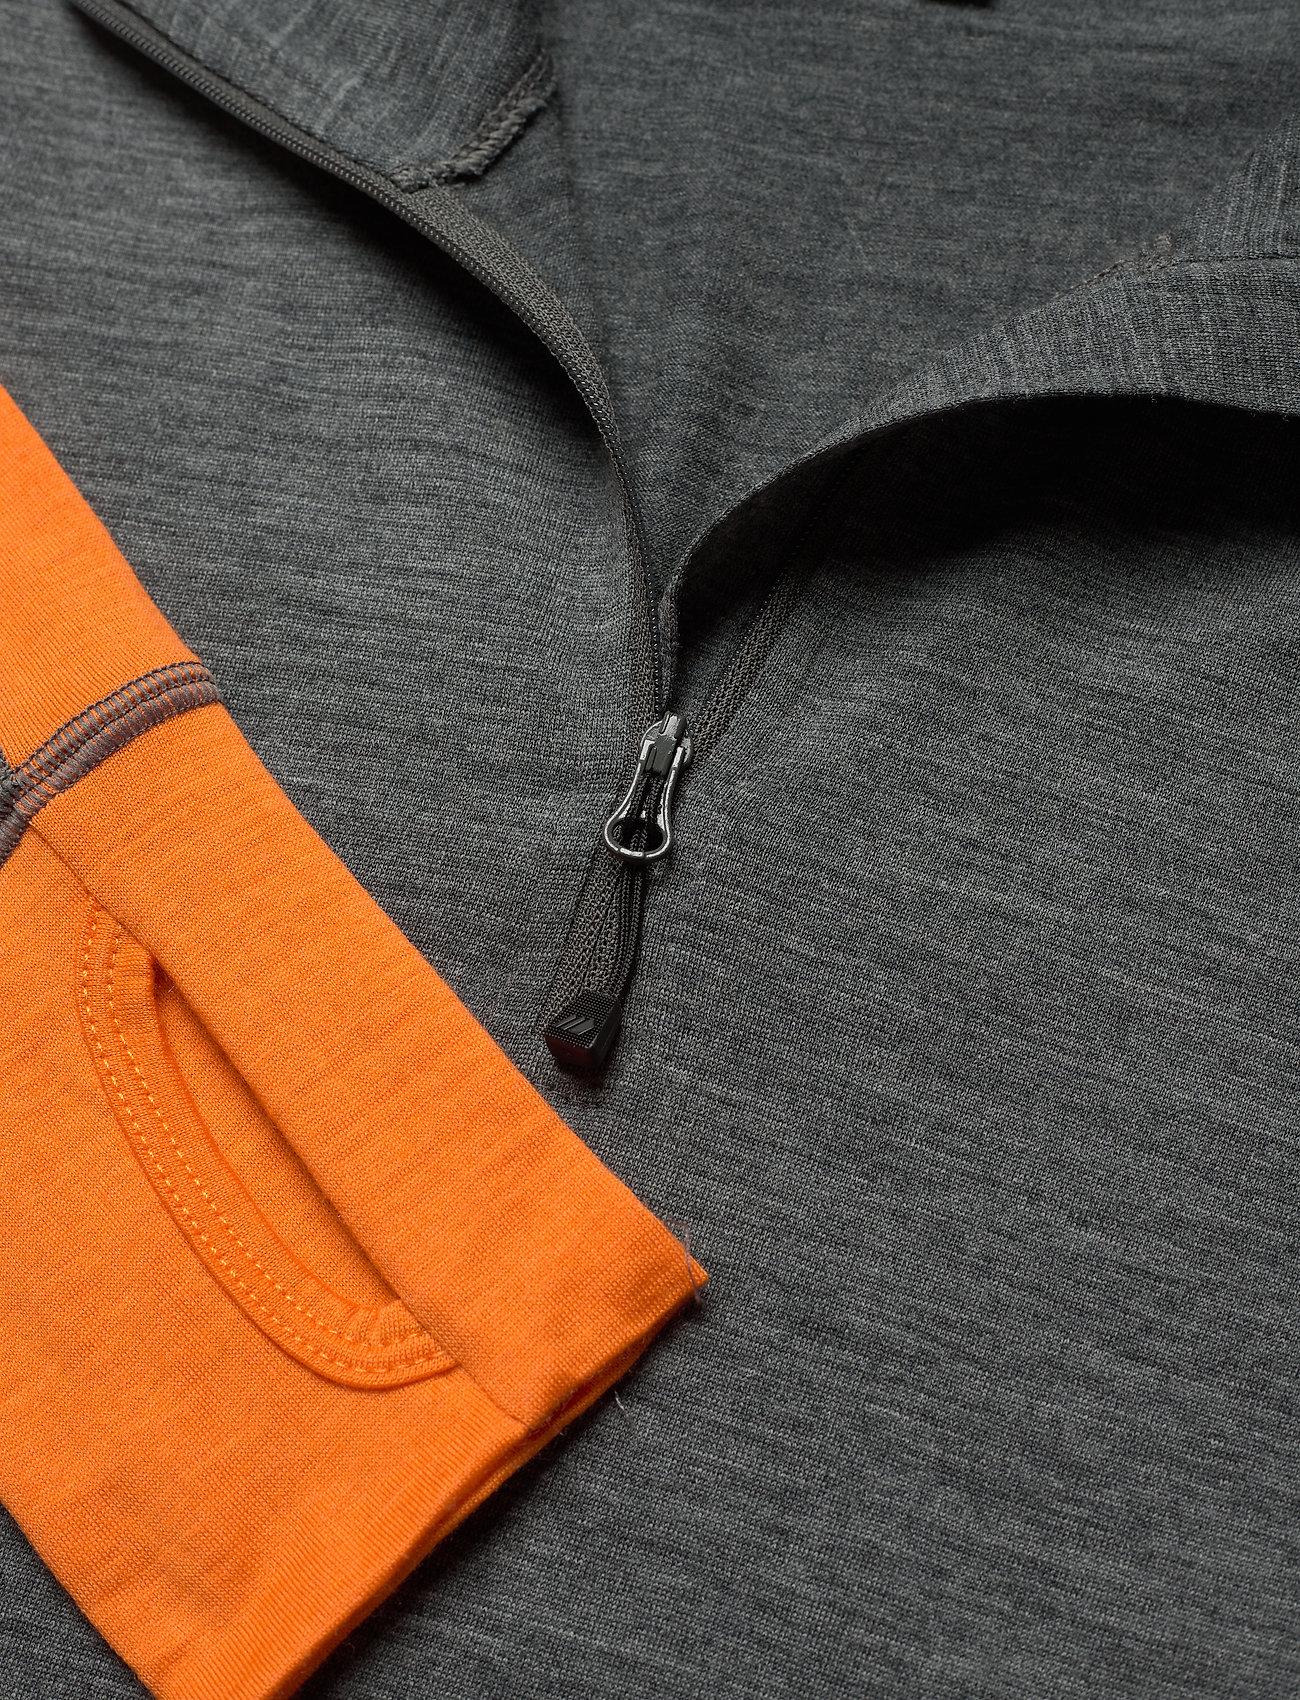 Skogstad Røstene merino wool half-zip - Innerlag JAFFA ORANGE - Menn Klær